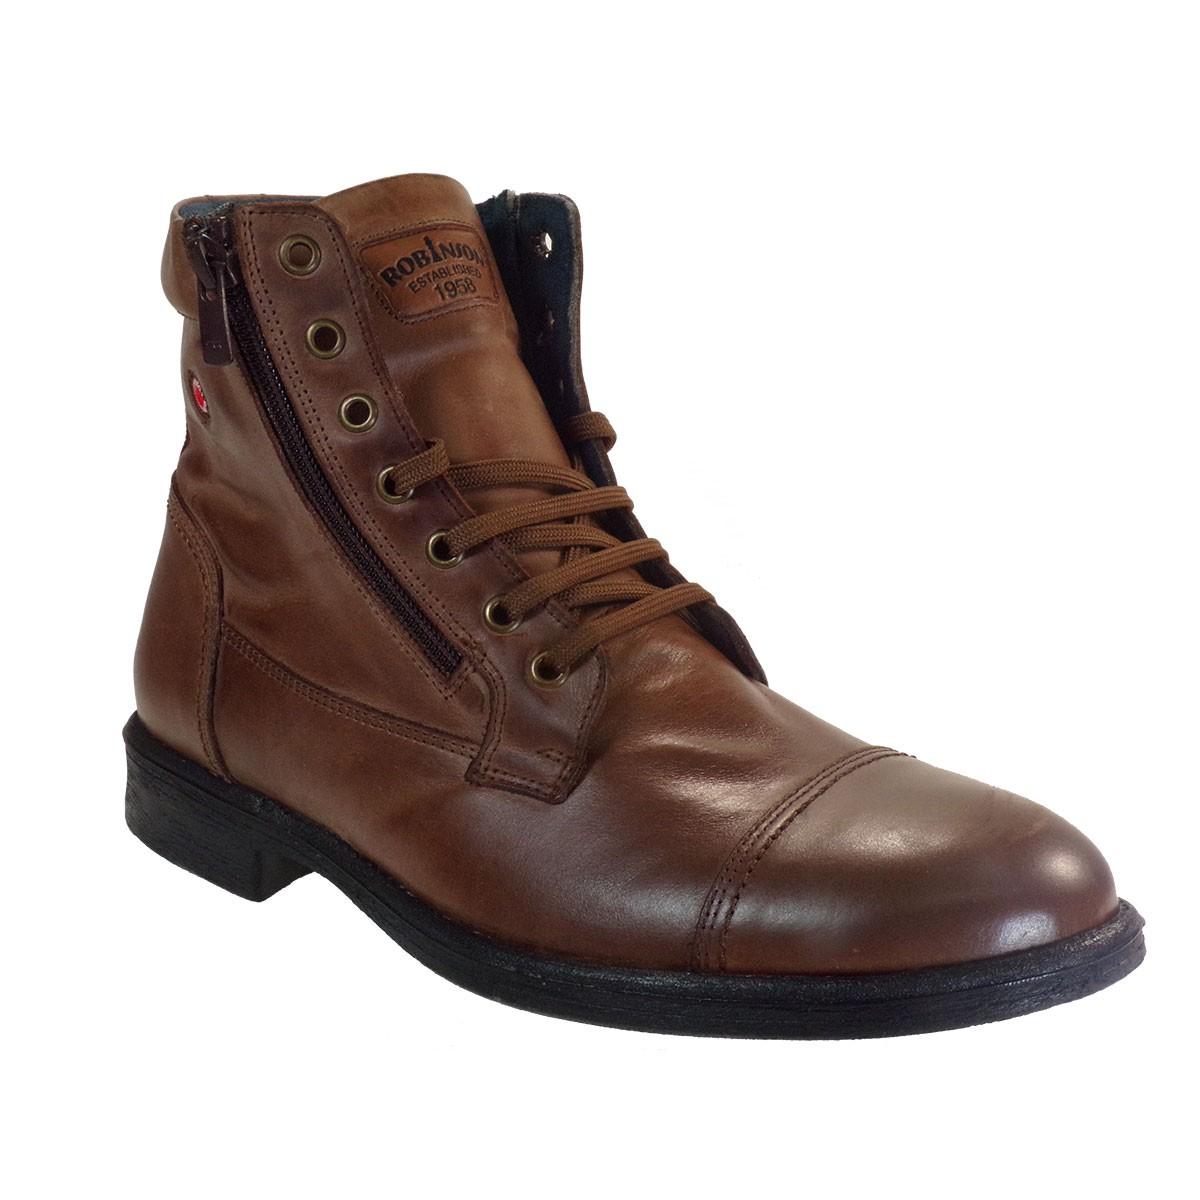 Robinson Ανδρικά Παπούτσια Μποτάκια Αρβυλάκια 2553 Καφέ Δέρμα